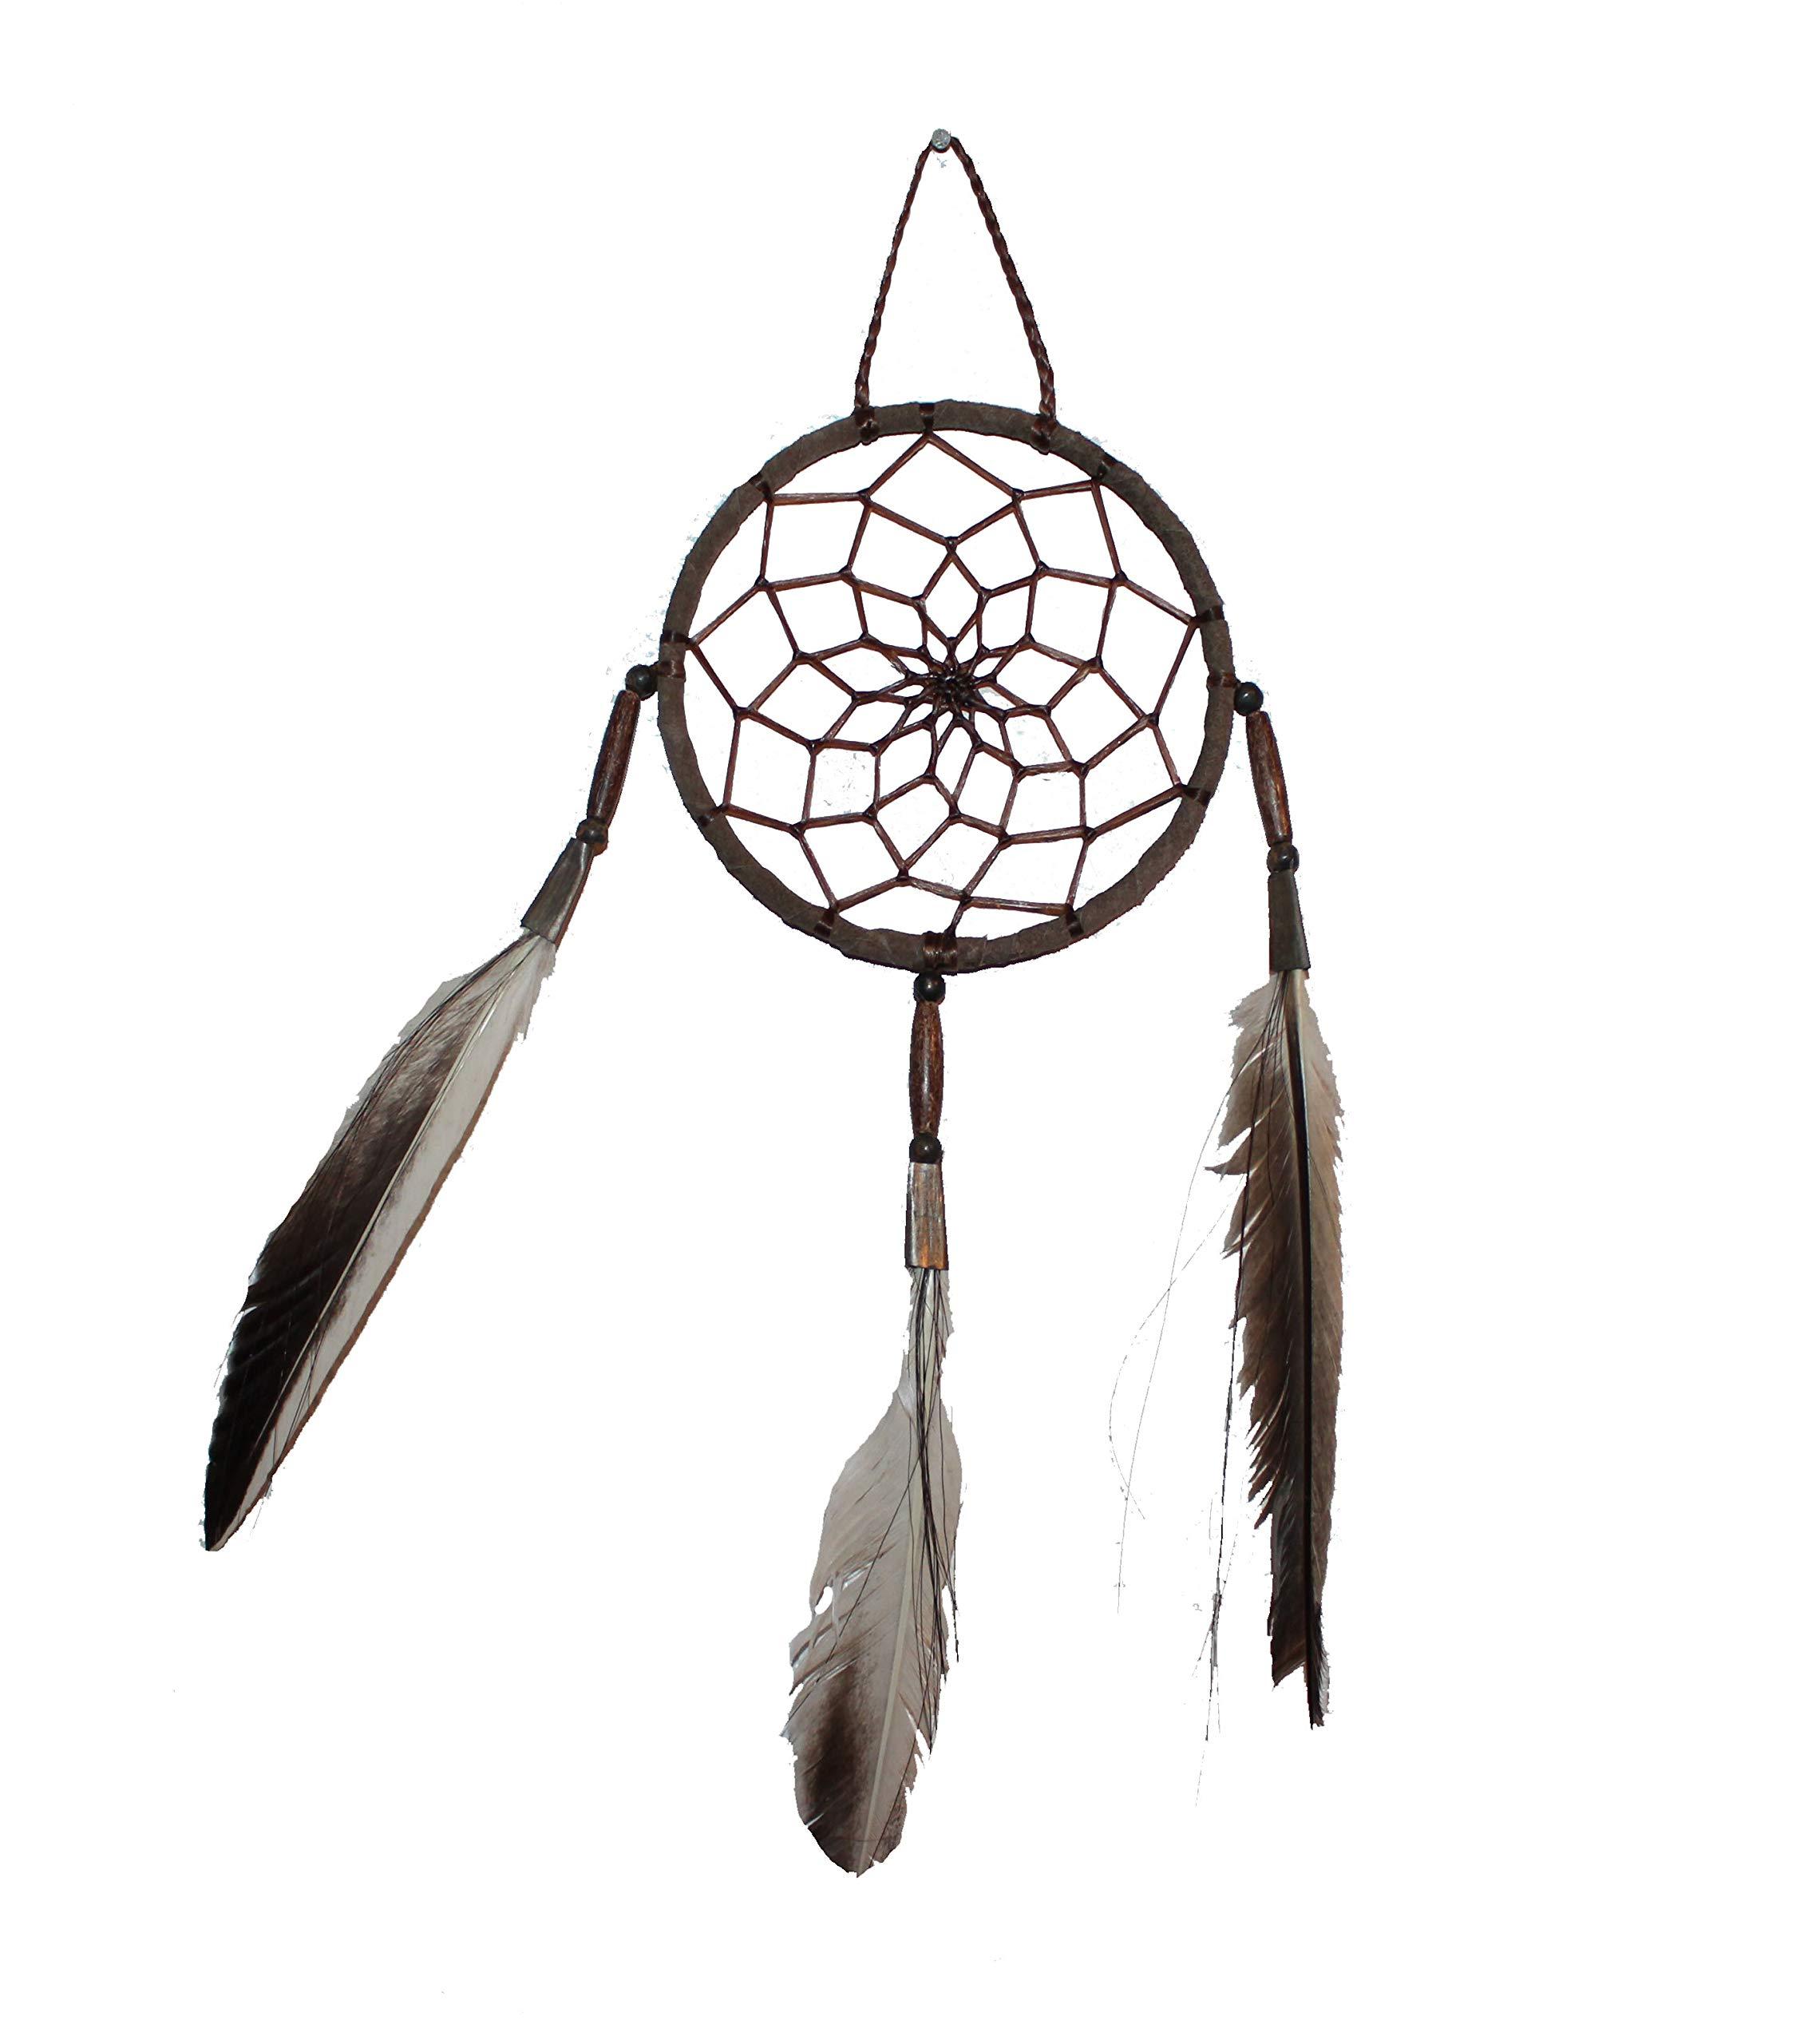 Native American Handmade Authentic Dream Catcher 4'' Diameter